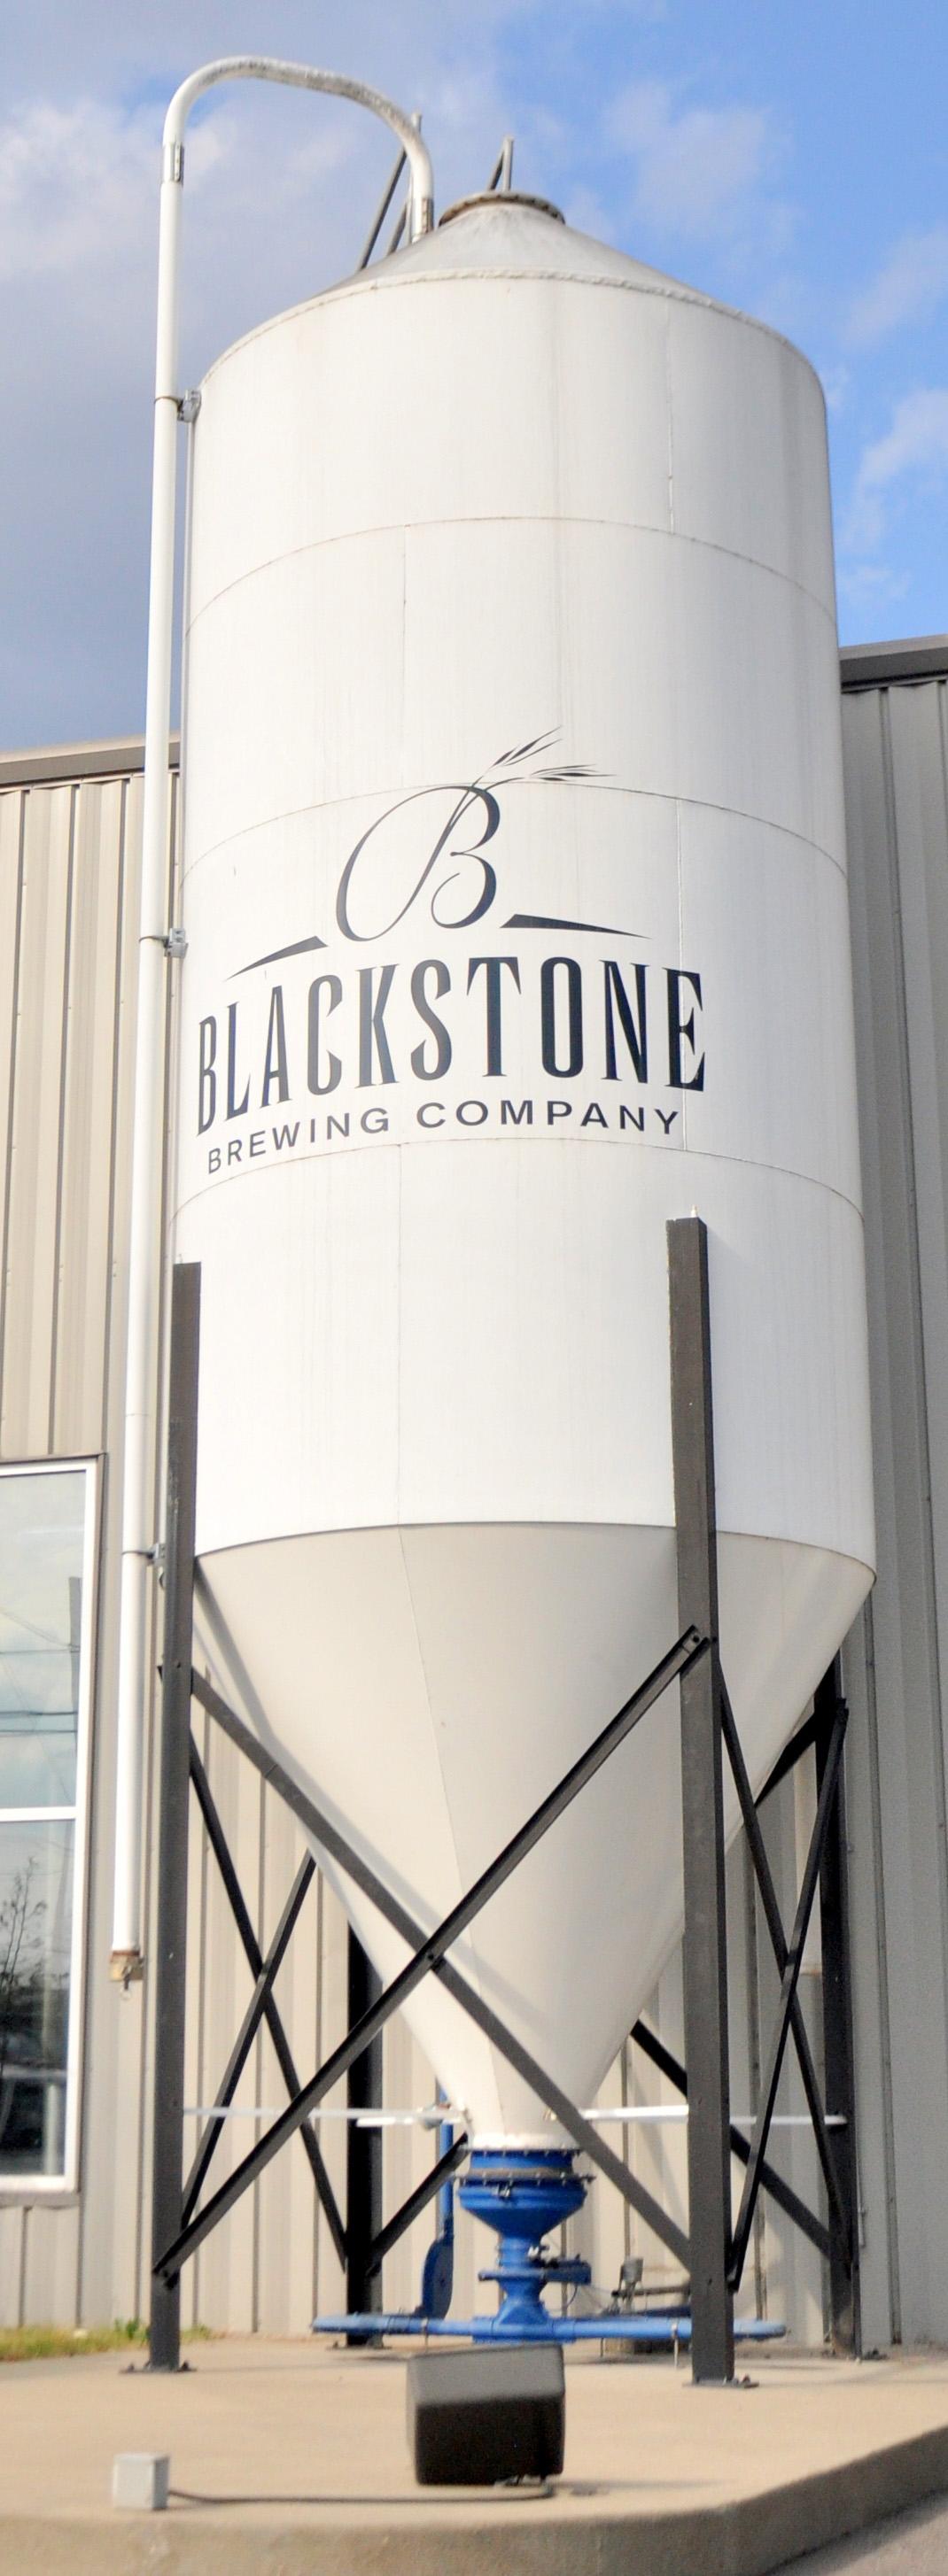 Blackstone skinny.jpg